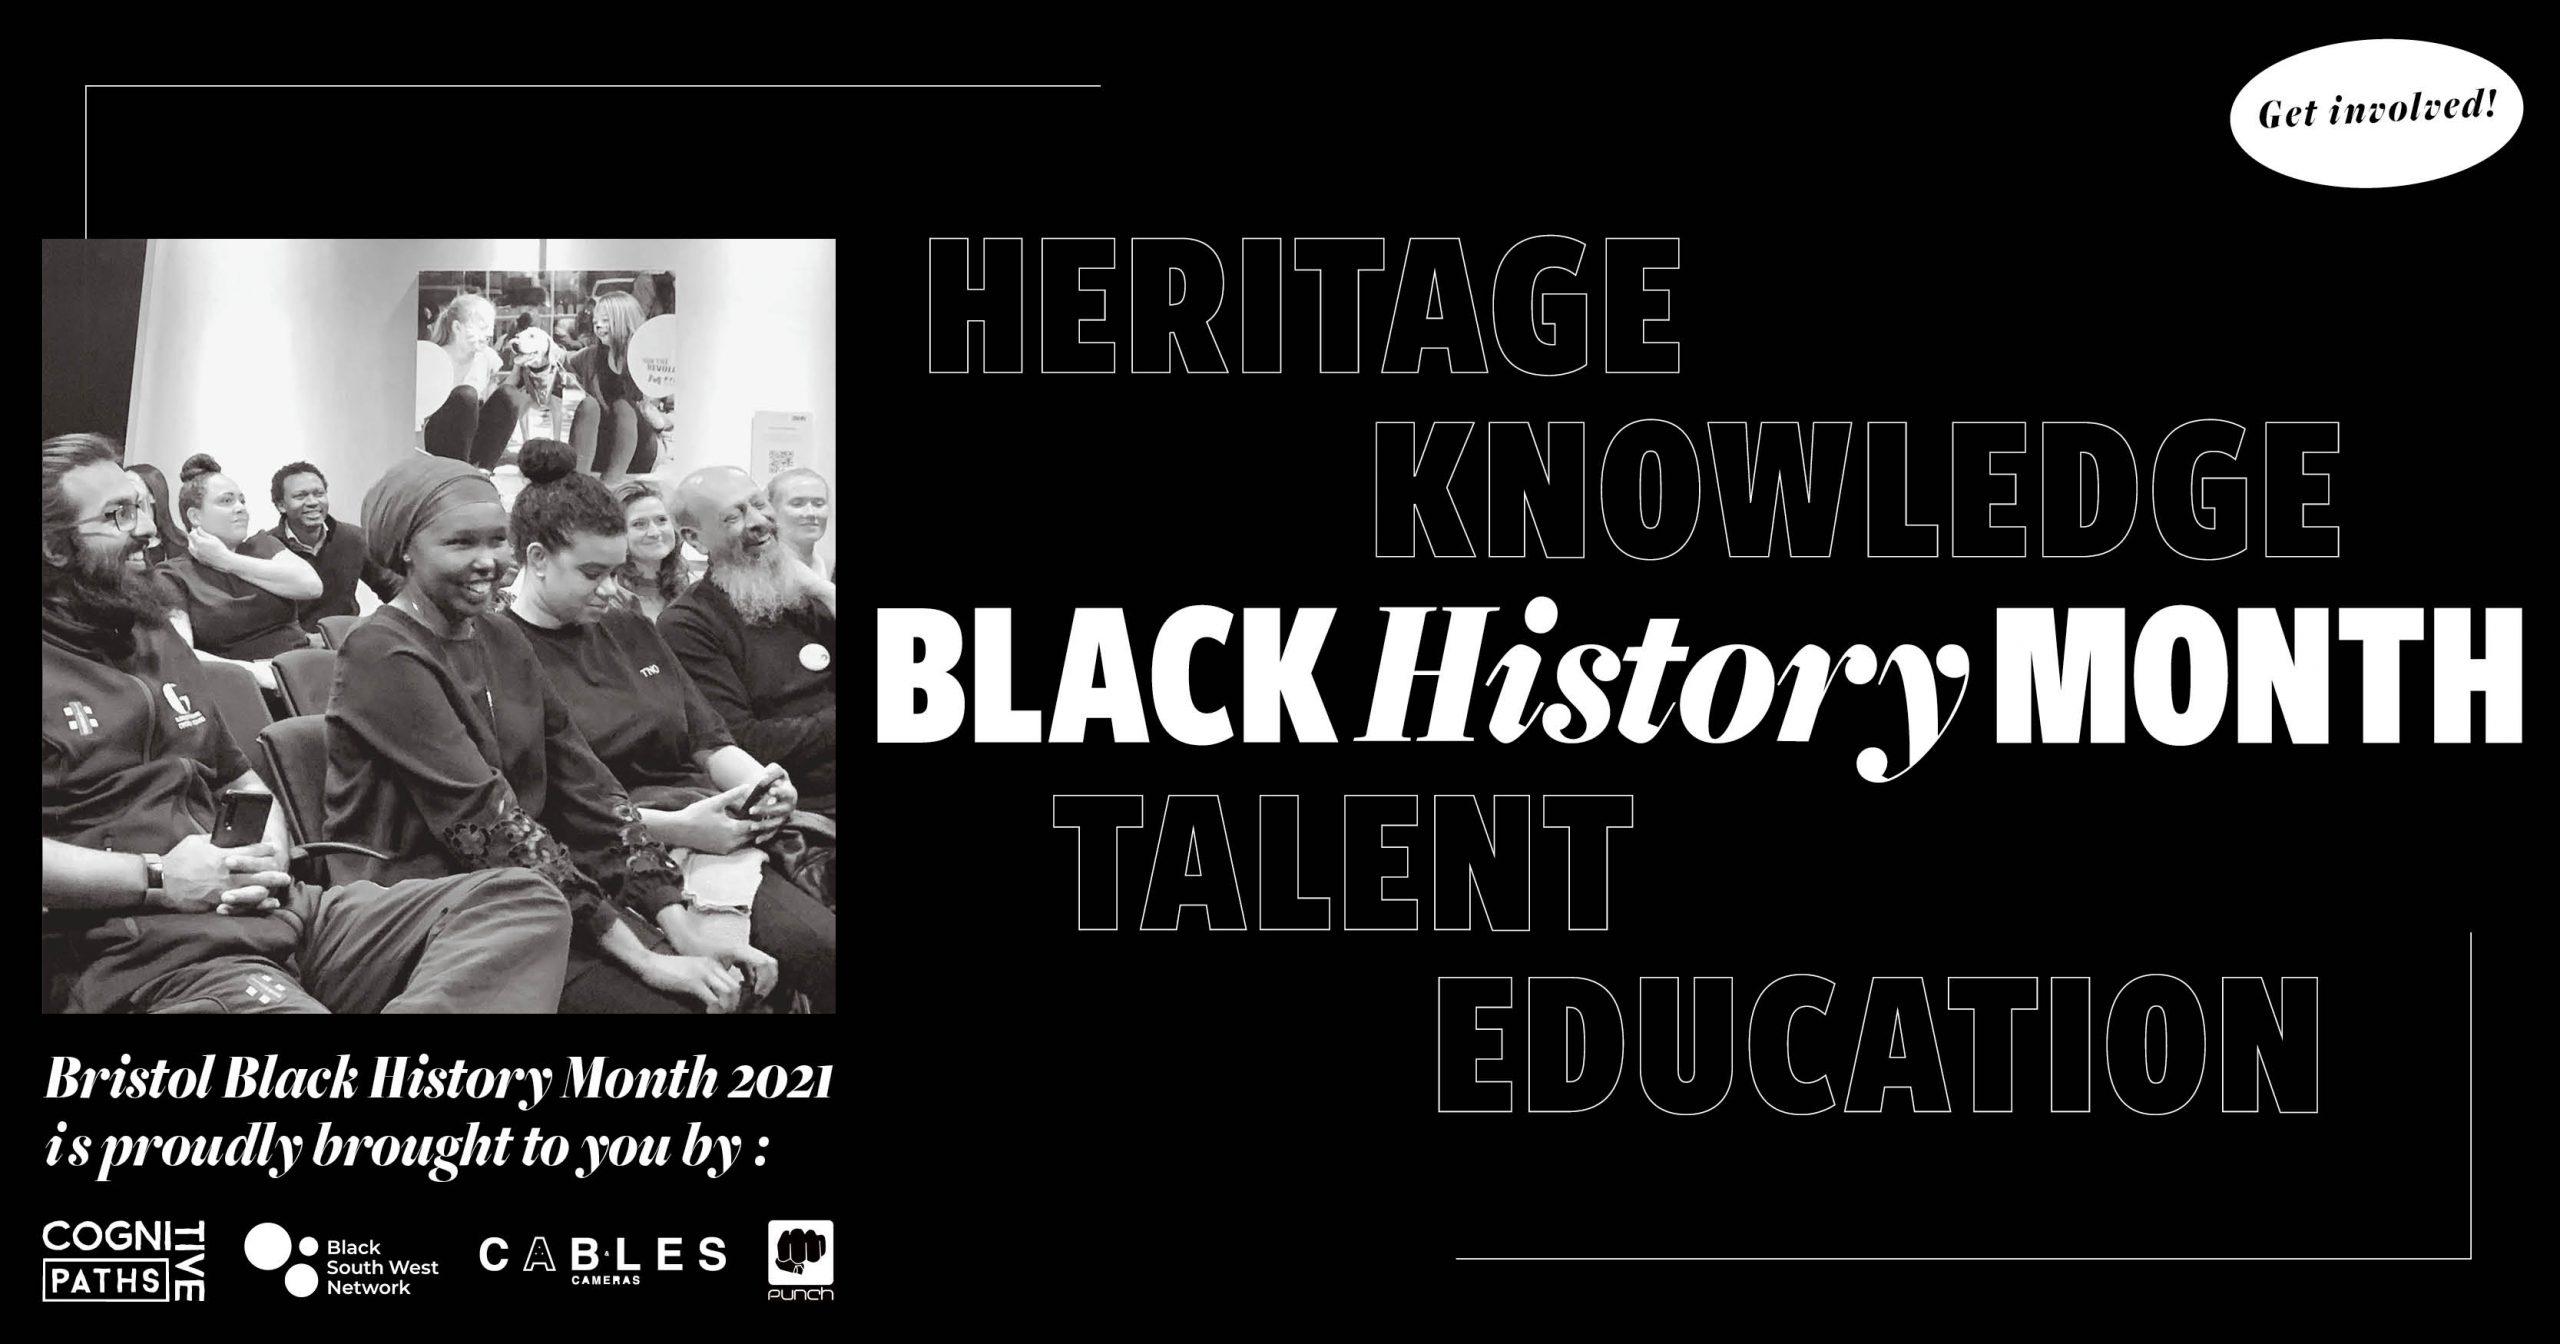 Bristol Black History Month